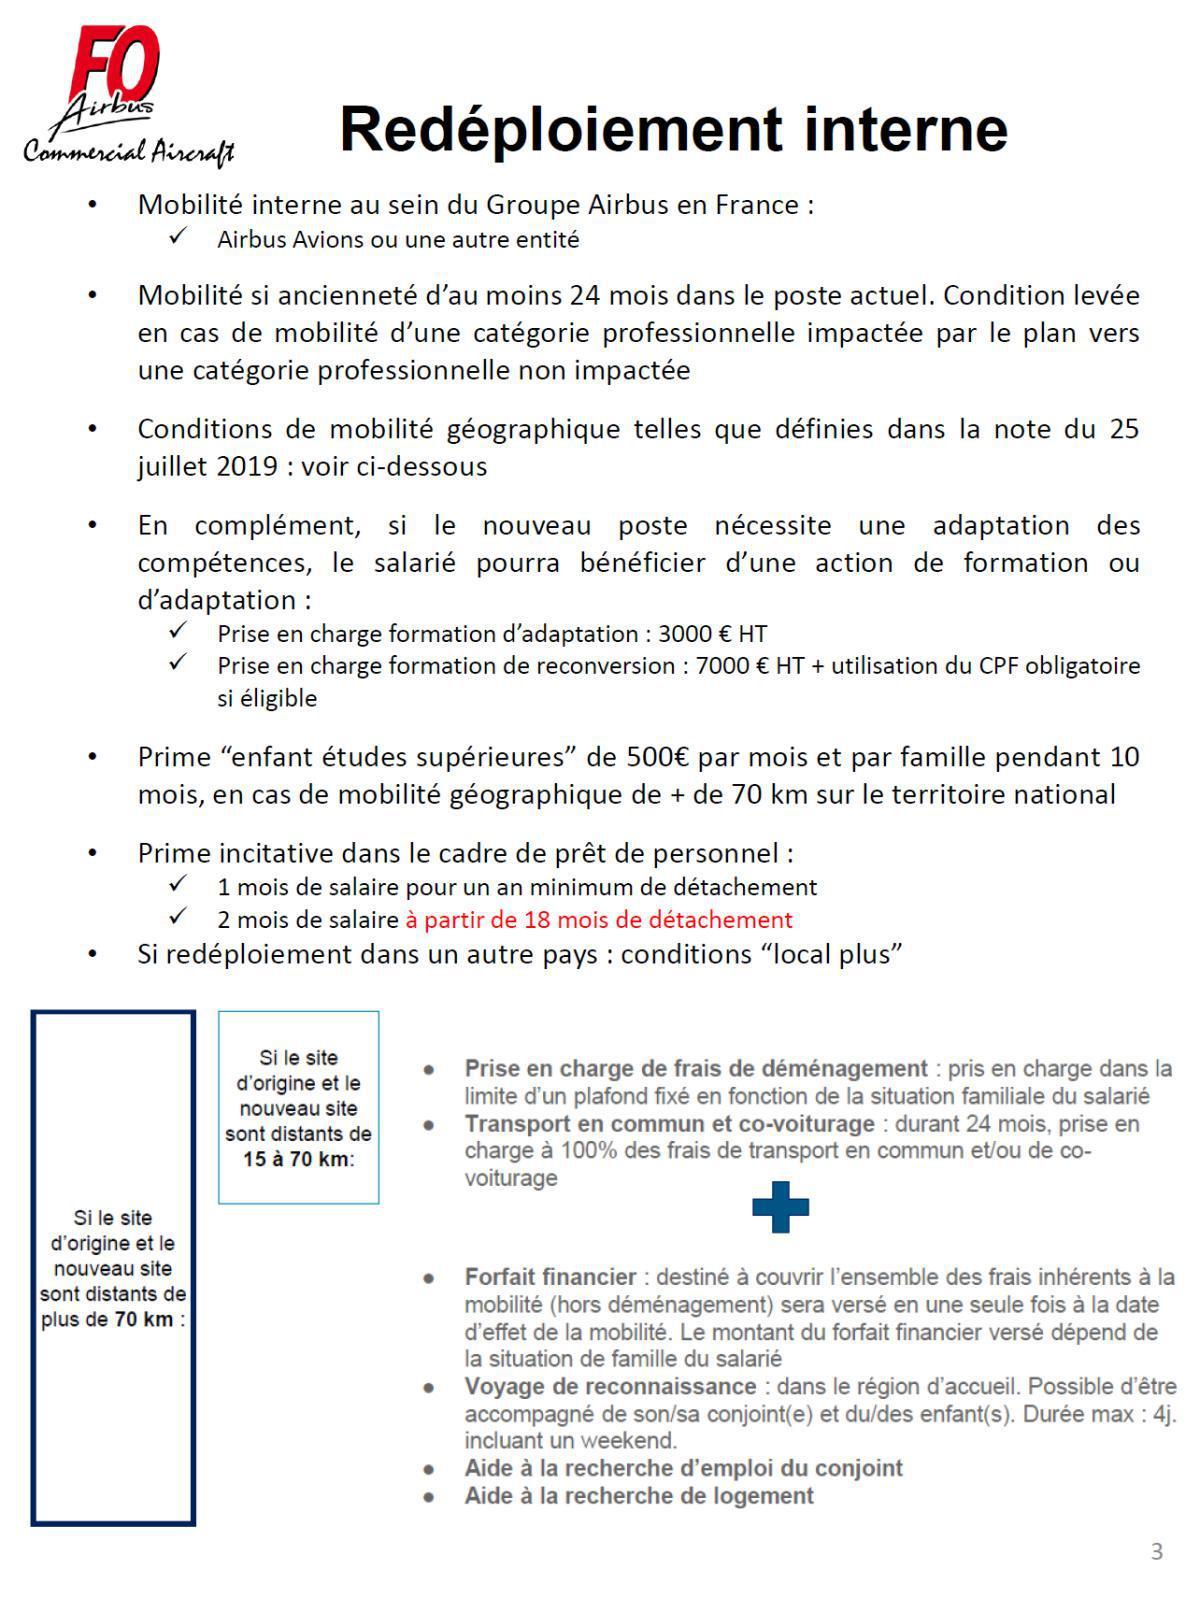 Synthèse sur les mesures sociales ODYSSEY (V6)